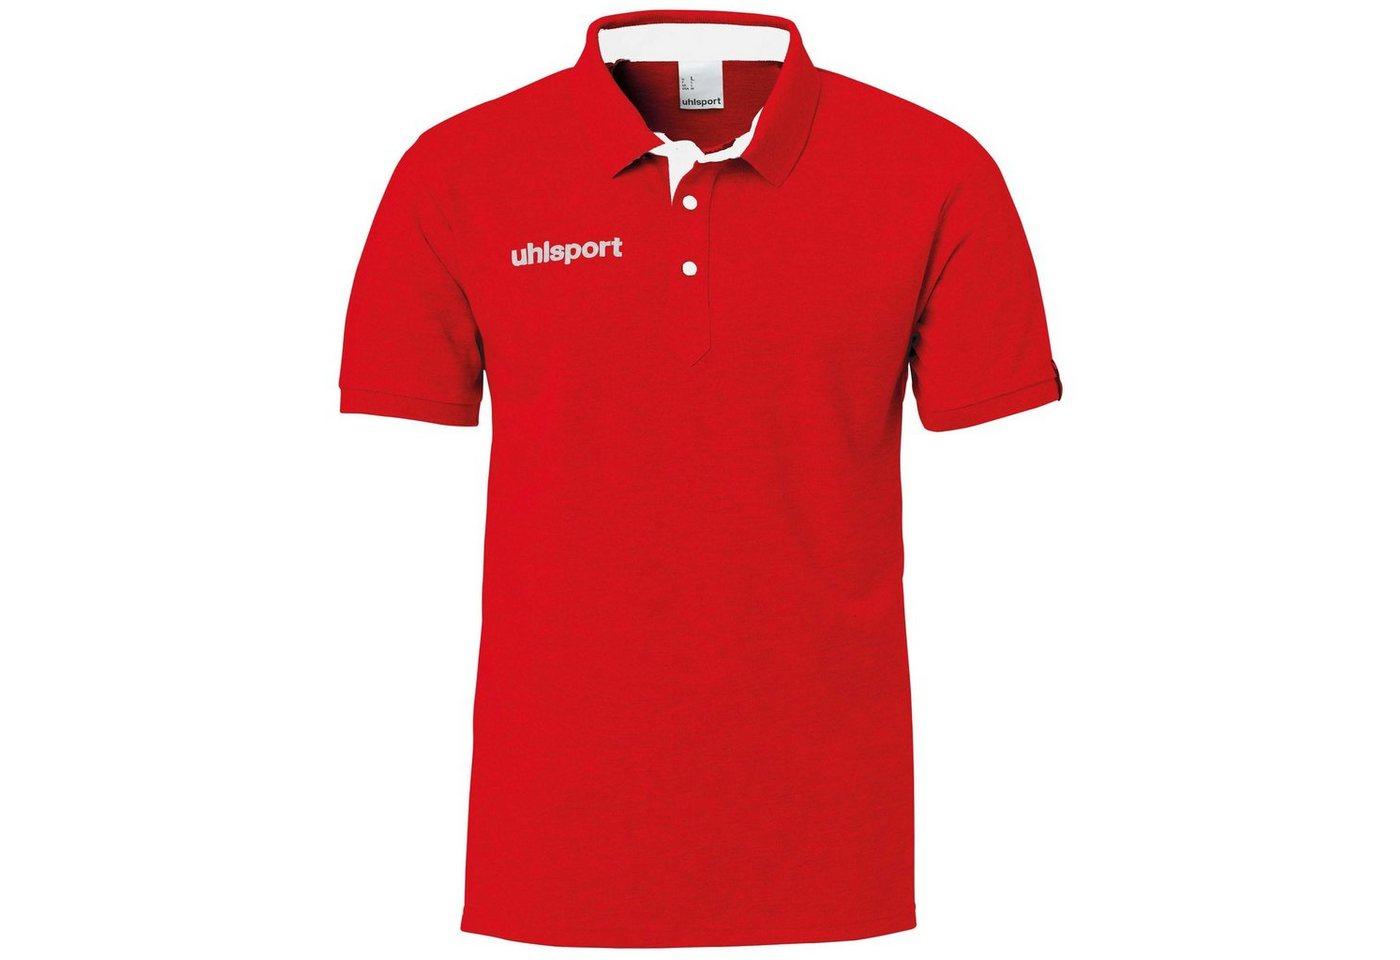 Uhlsport Essential Prime Poloshirt Herren | Sportbekleidung > Sportshirts > Poloshirts | Rot | Uhlsport